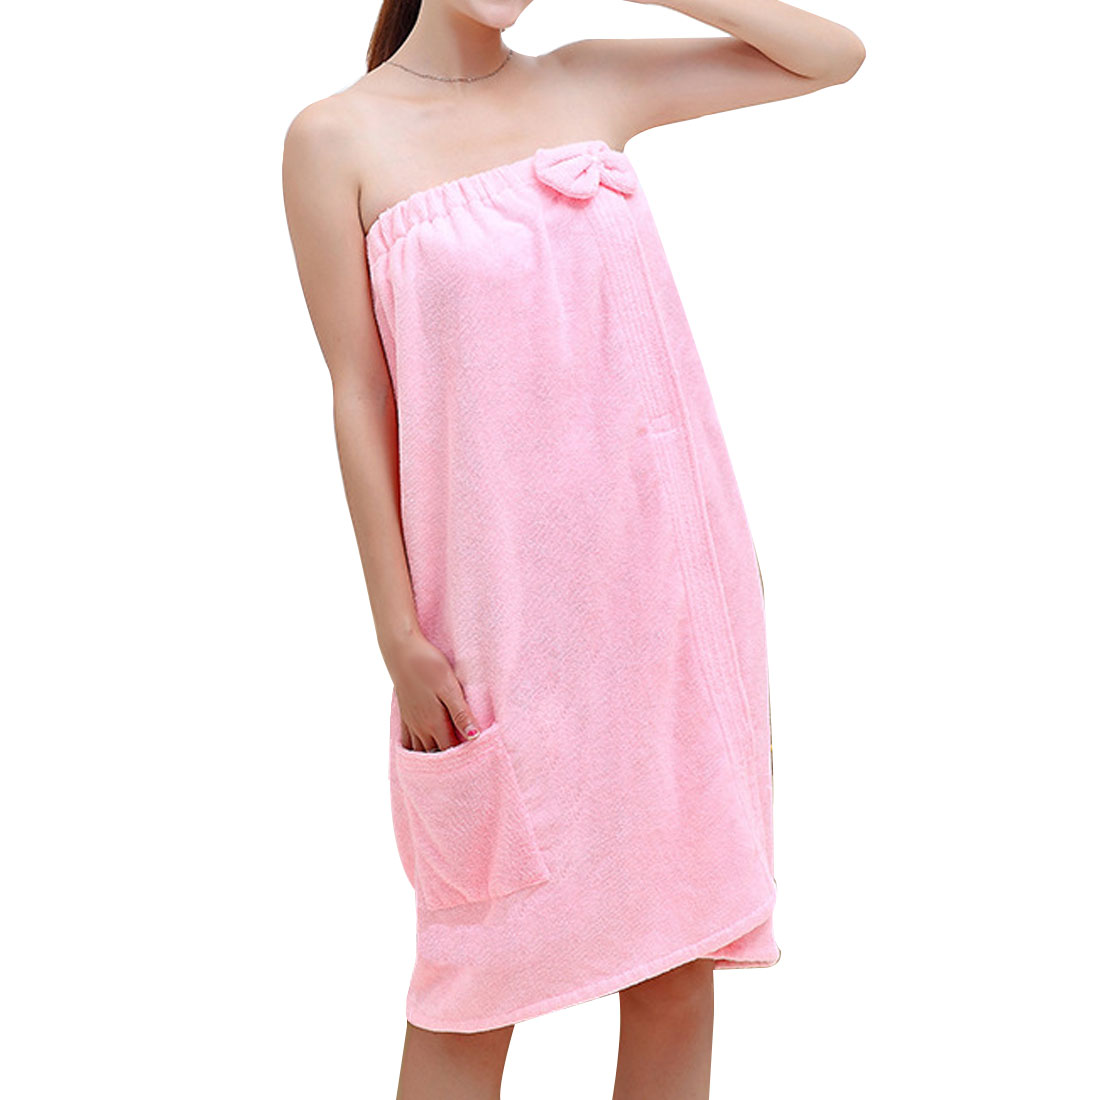 Lady Microfiber Elastic Bowknot Beach Swimming Shower Bath Towel Wrap Skirt Washcloth Pink